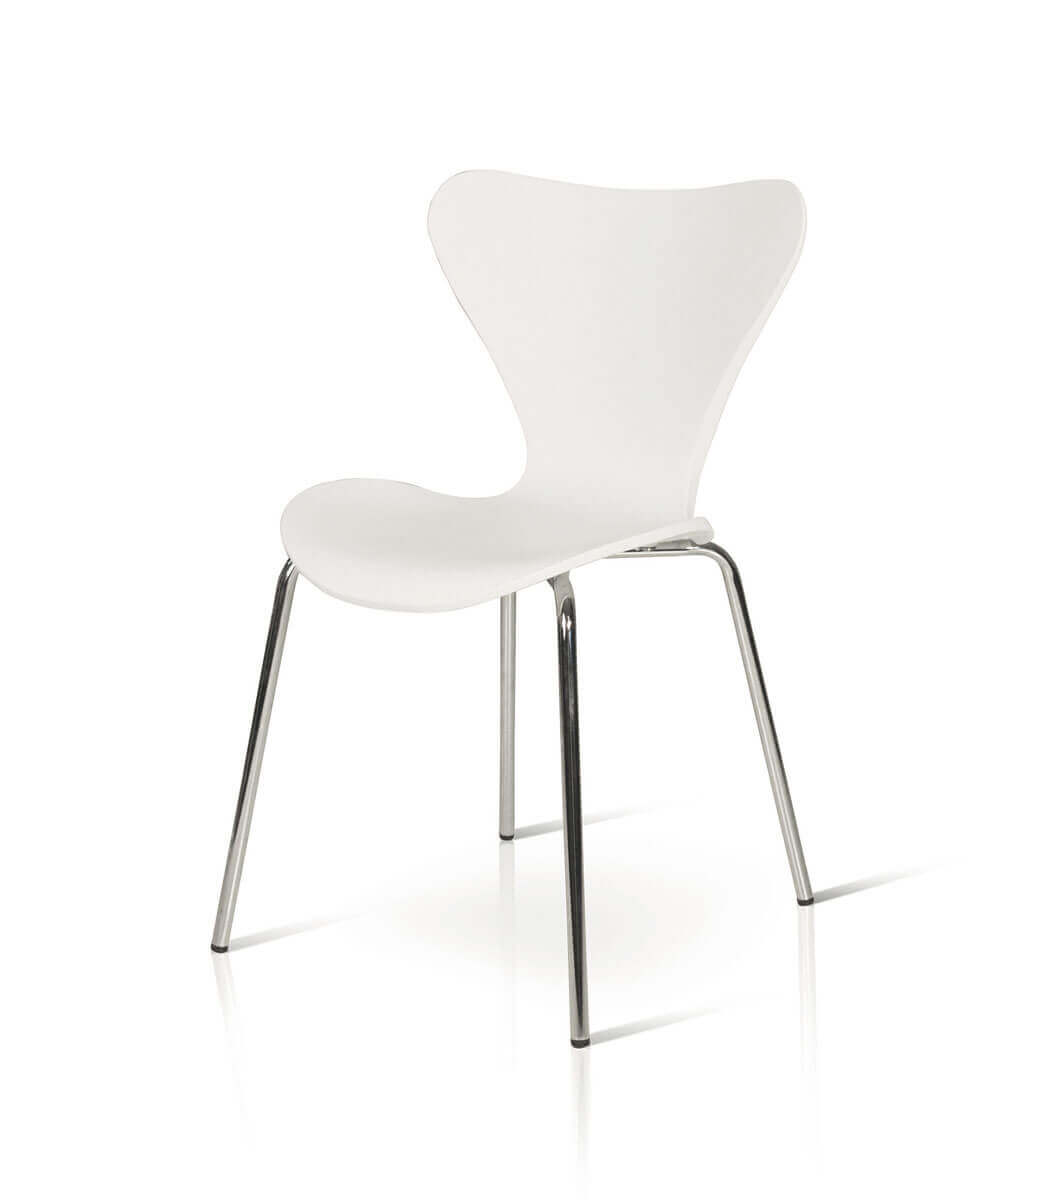 Sedie Moderne In Offerta.Sedie In Plastica Pvc Impilabili Moderne Bianche O Nere Spazio Casa